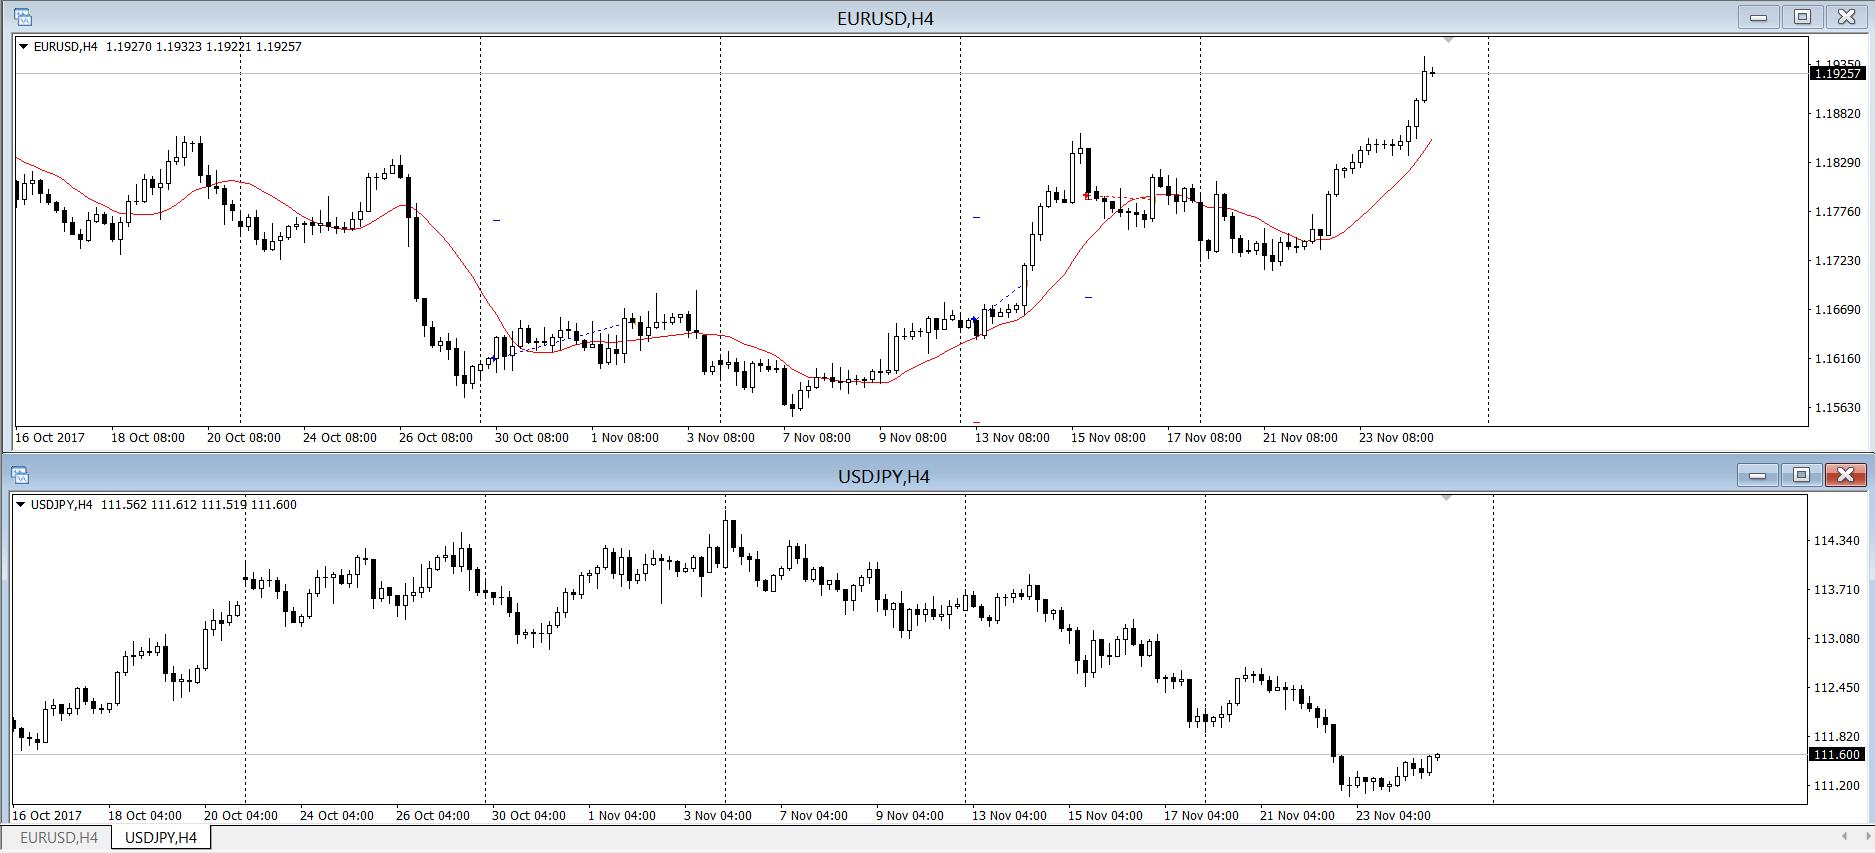 Корреляция usd/jpy и eur/usd